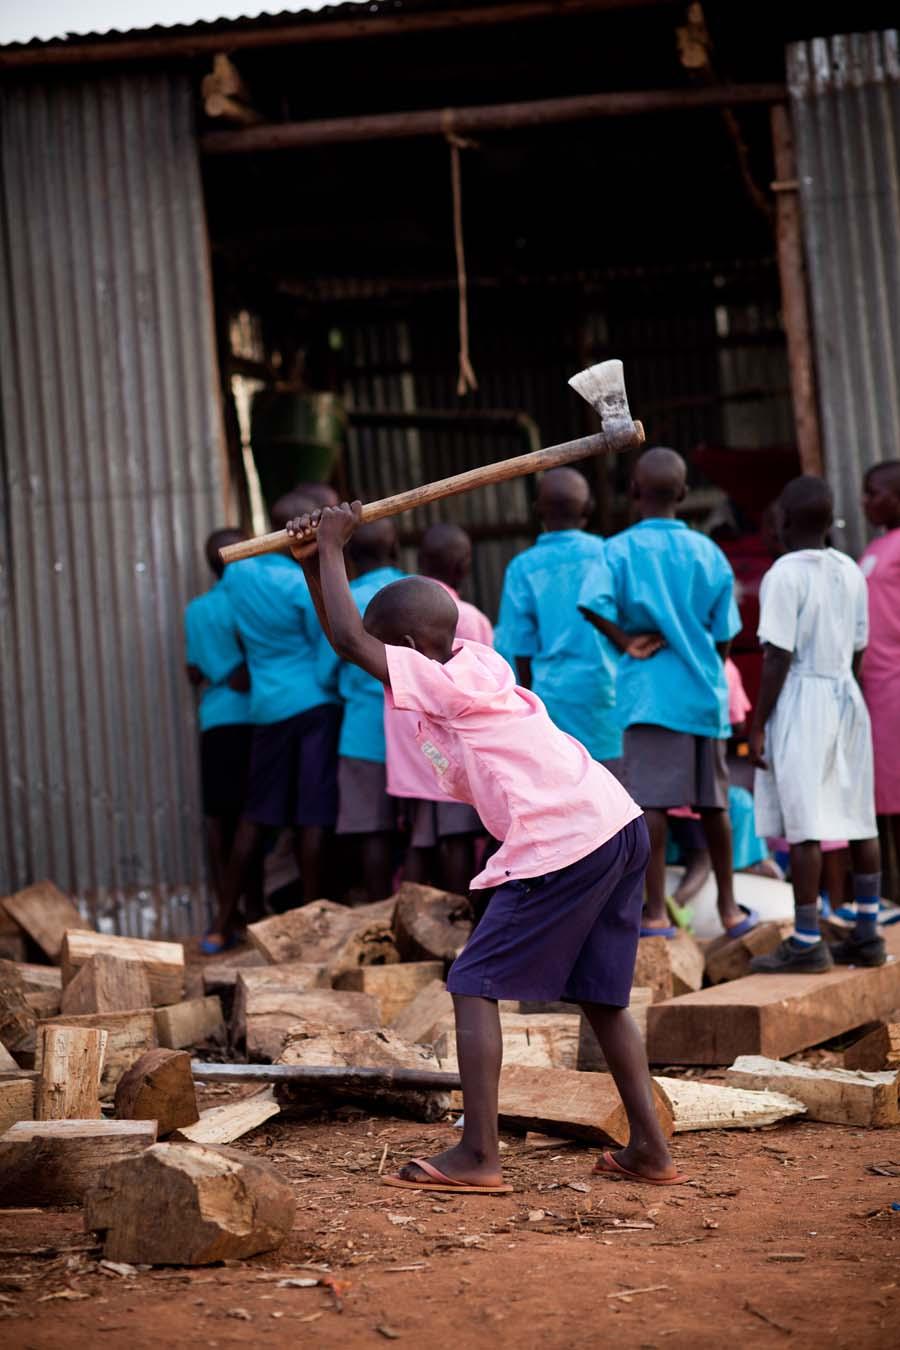 jessicadavisphotography.com | Jessica Davis Photography | Portrait Work in Uganda| Travel Photographer | World Event Photographs 1 (5).jpg